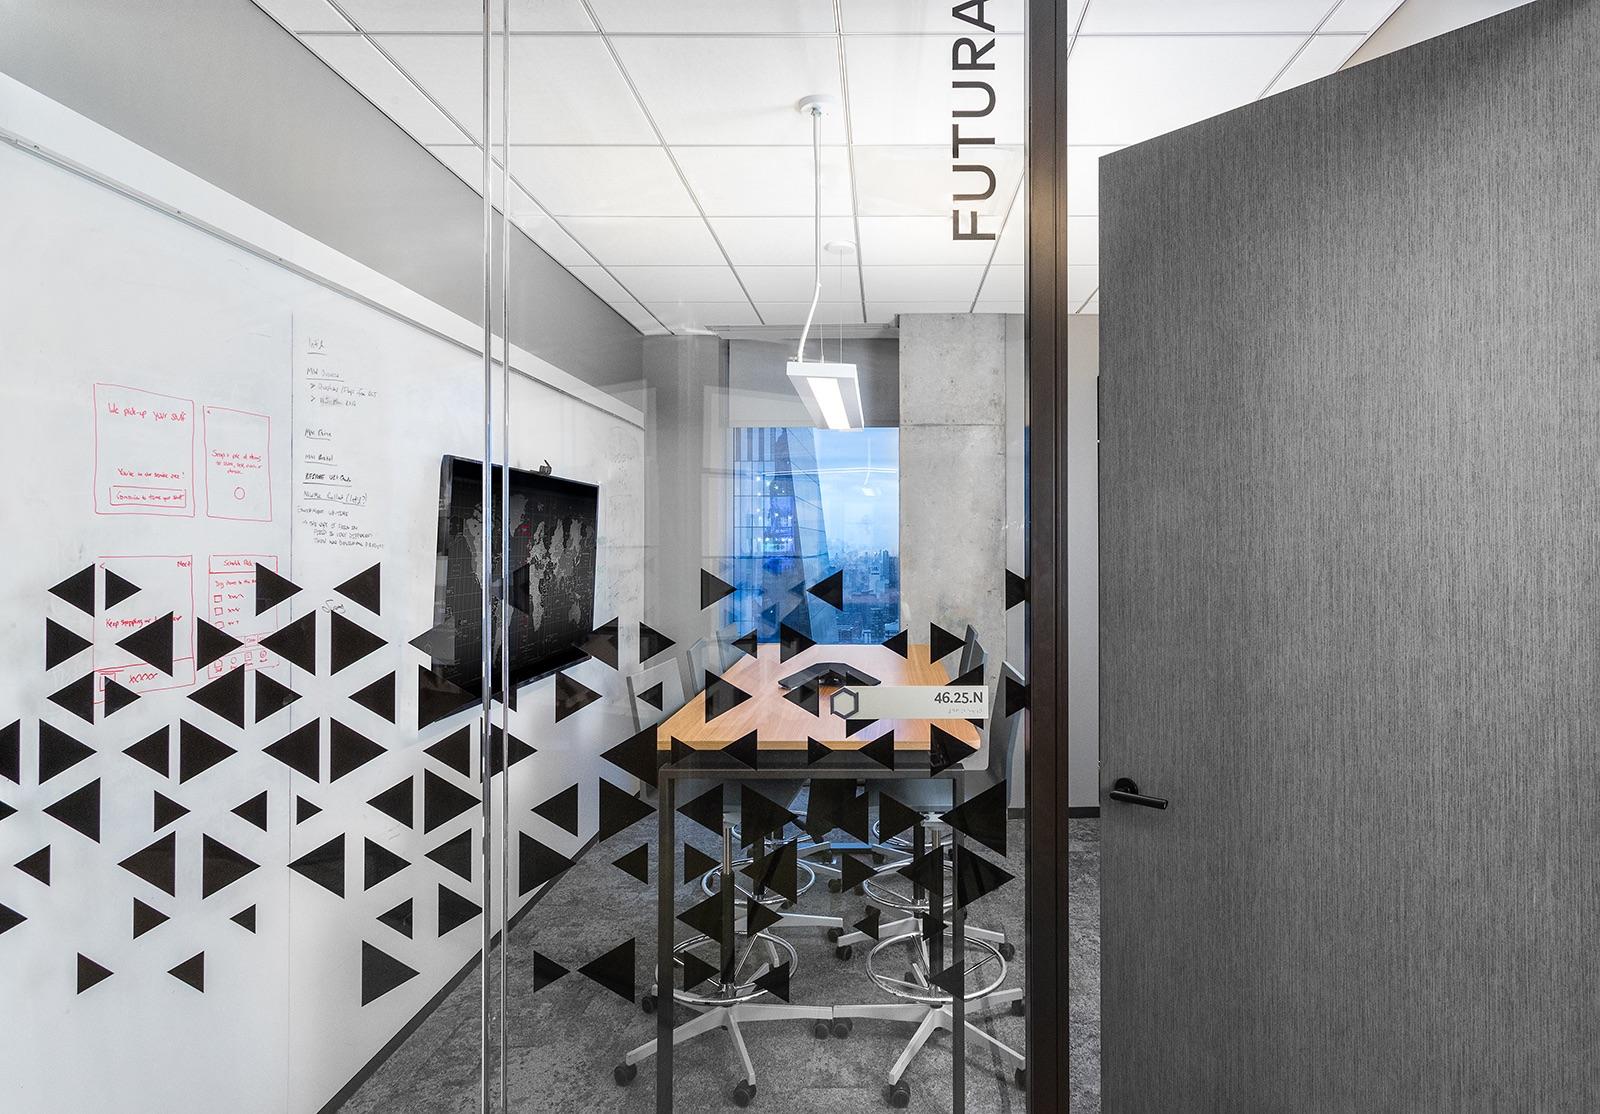 bcg-digital-ventures-office-11